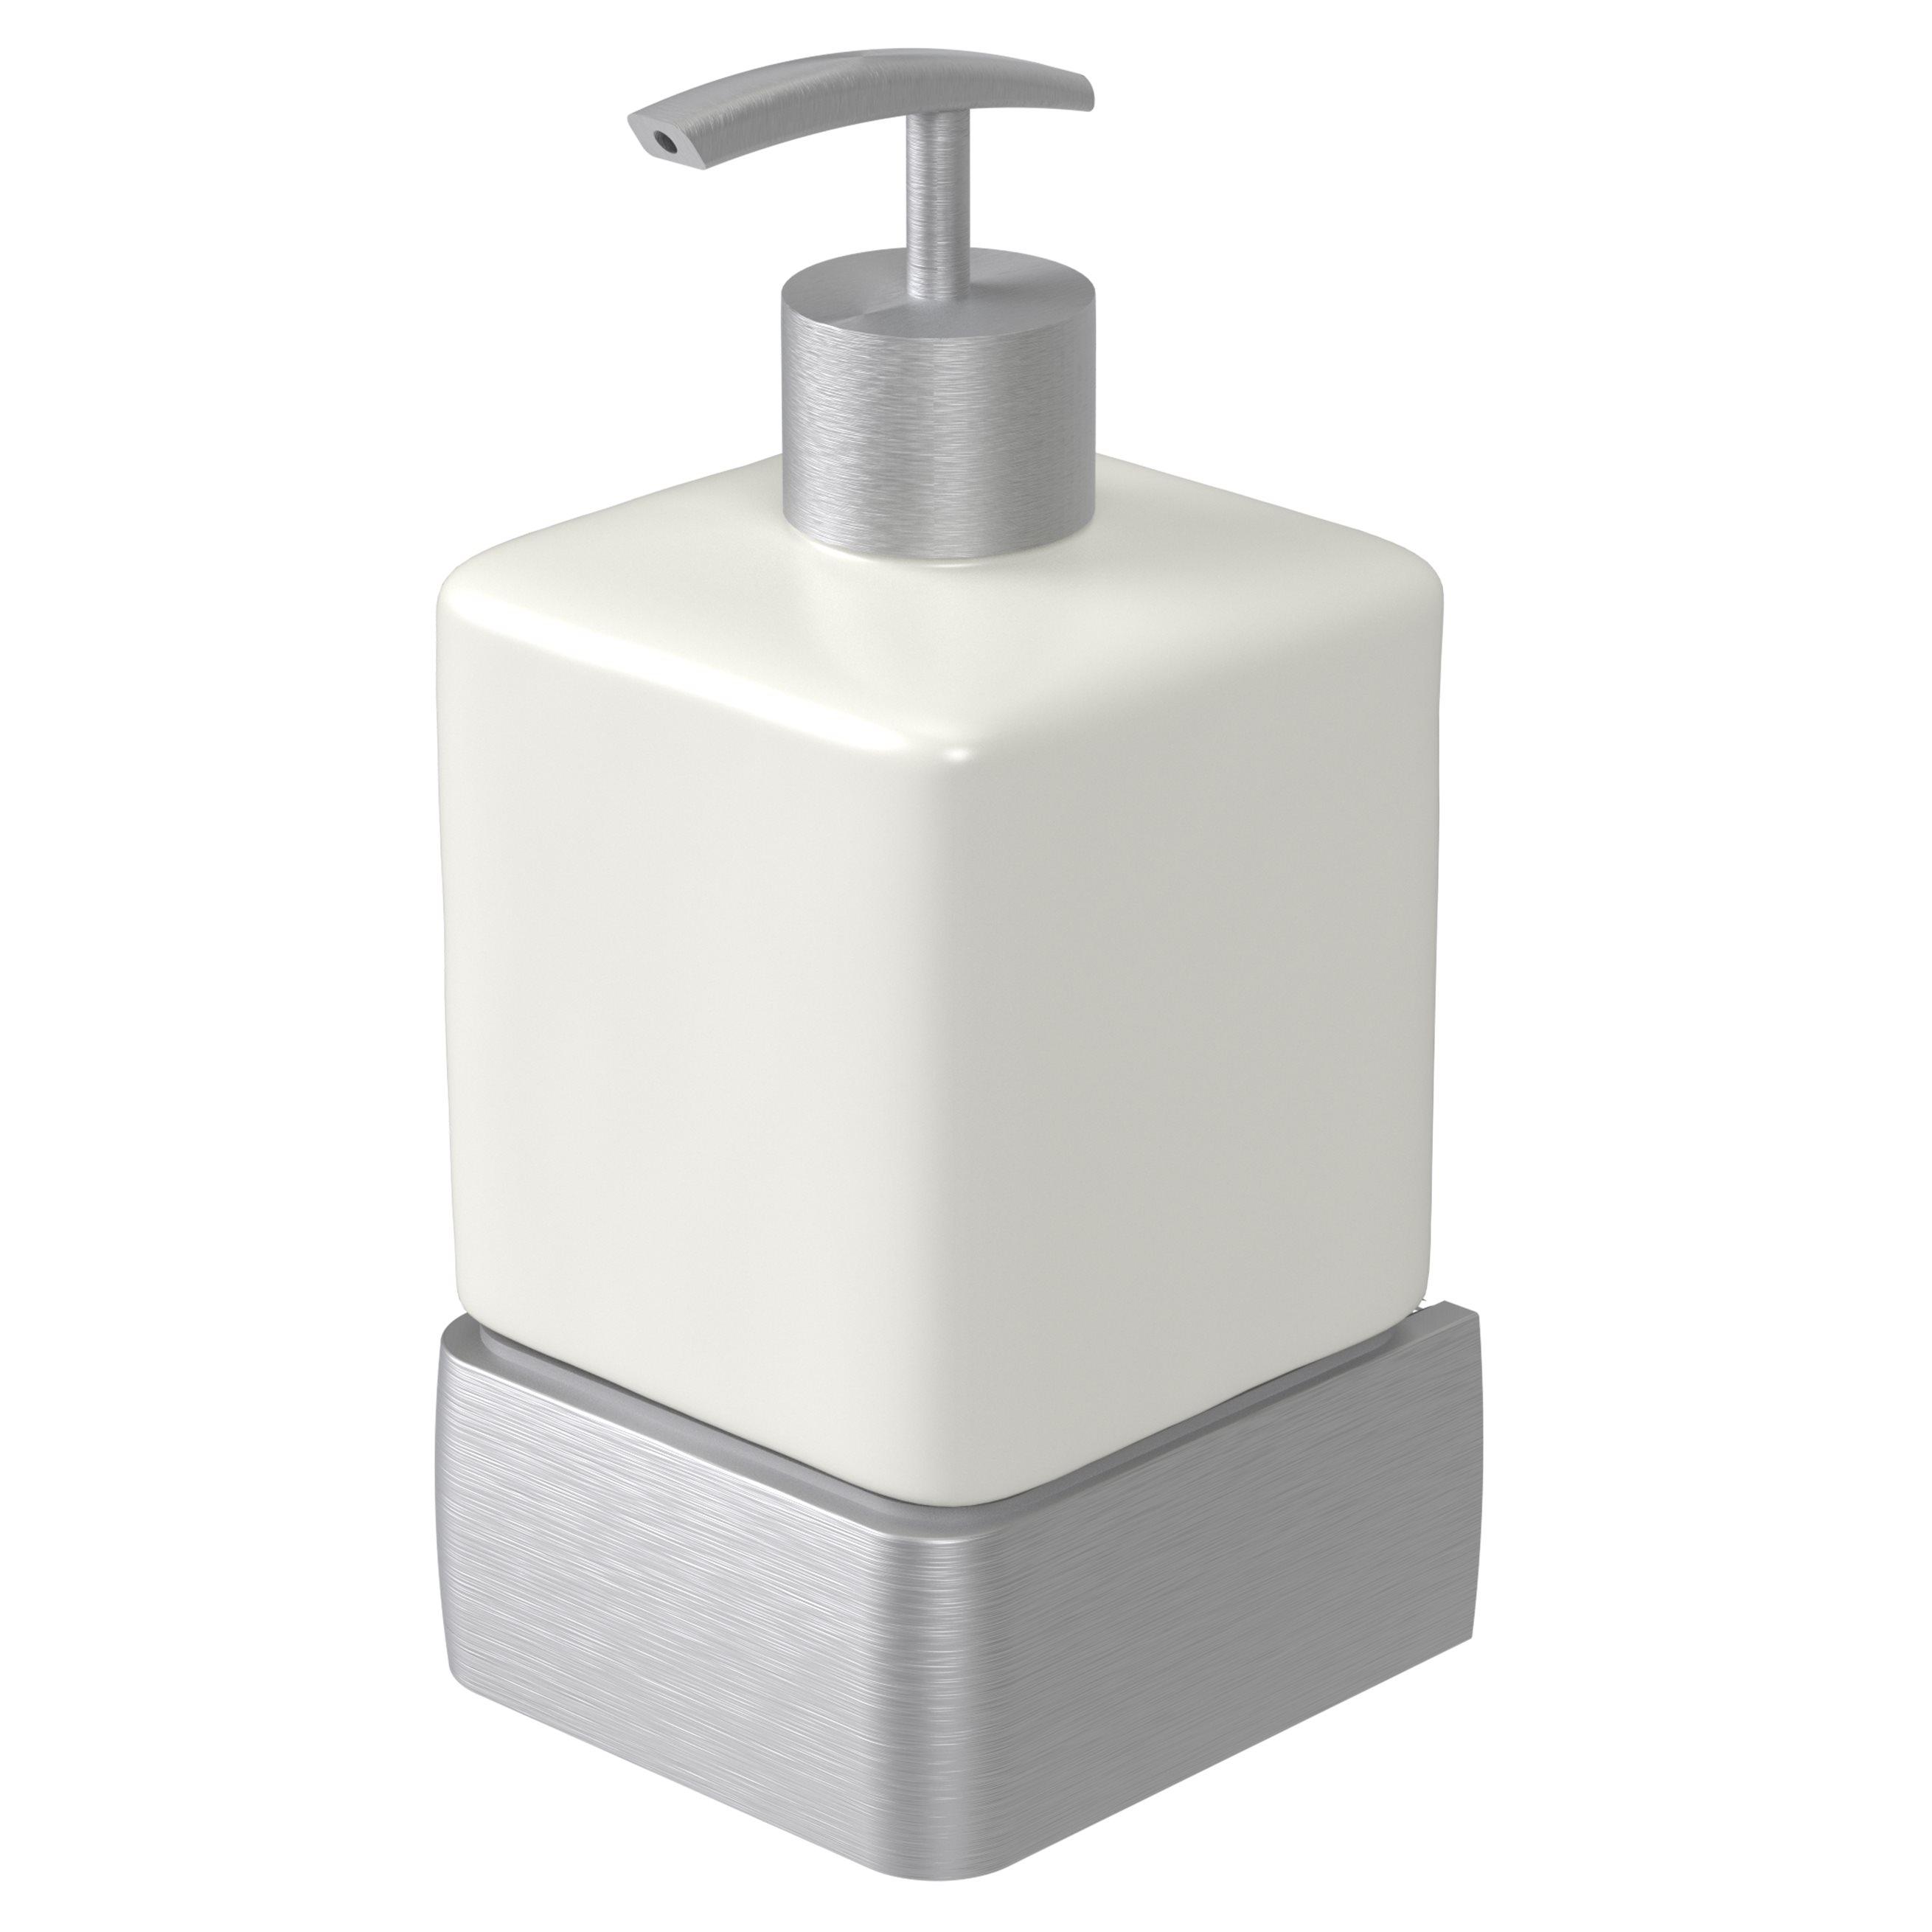 Haceka Aline zeepdispenser geborsteld aluminium